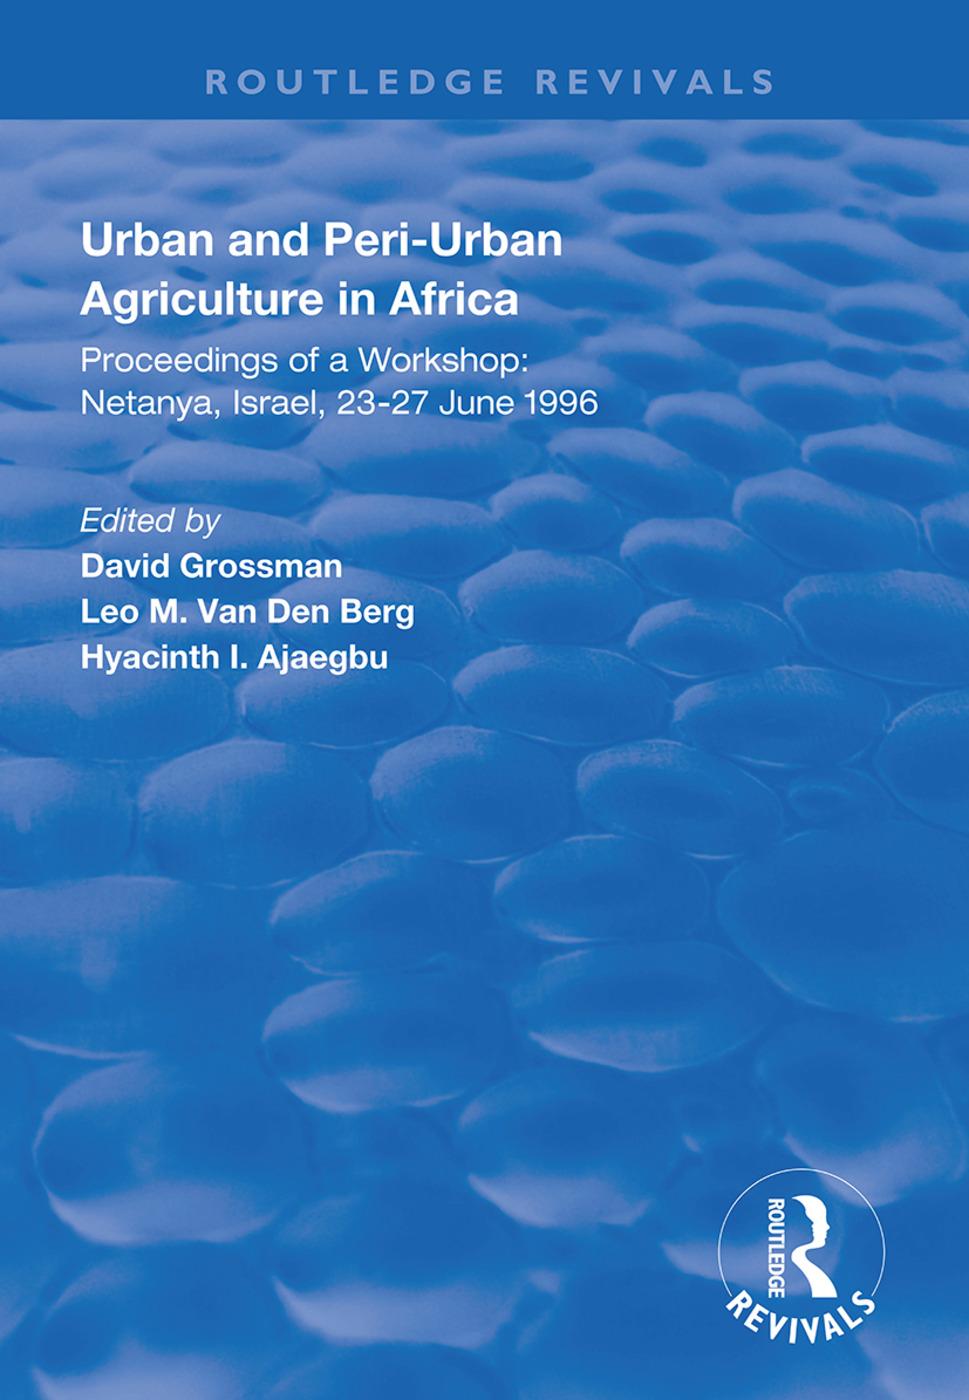 Urban and Peri-urban Agriculture in Africa: Proceedings of a Workshop, Netanya, Israel, 23-27 June 1996 book cover